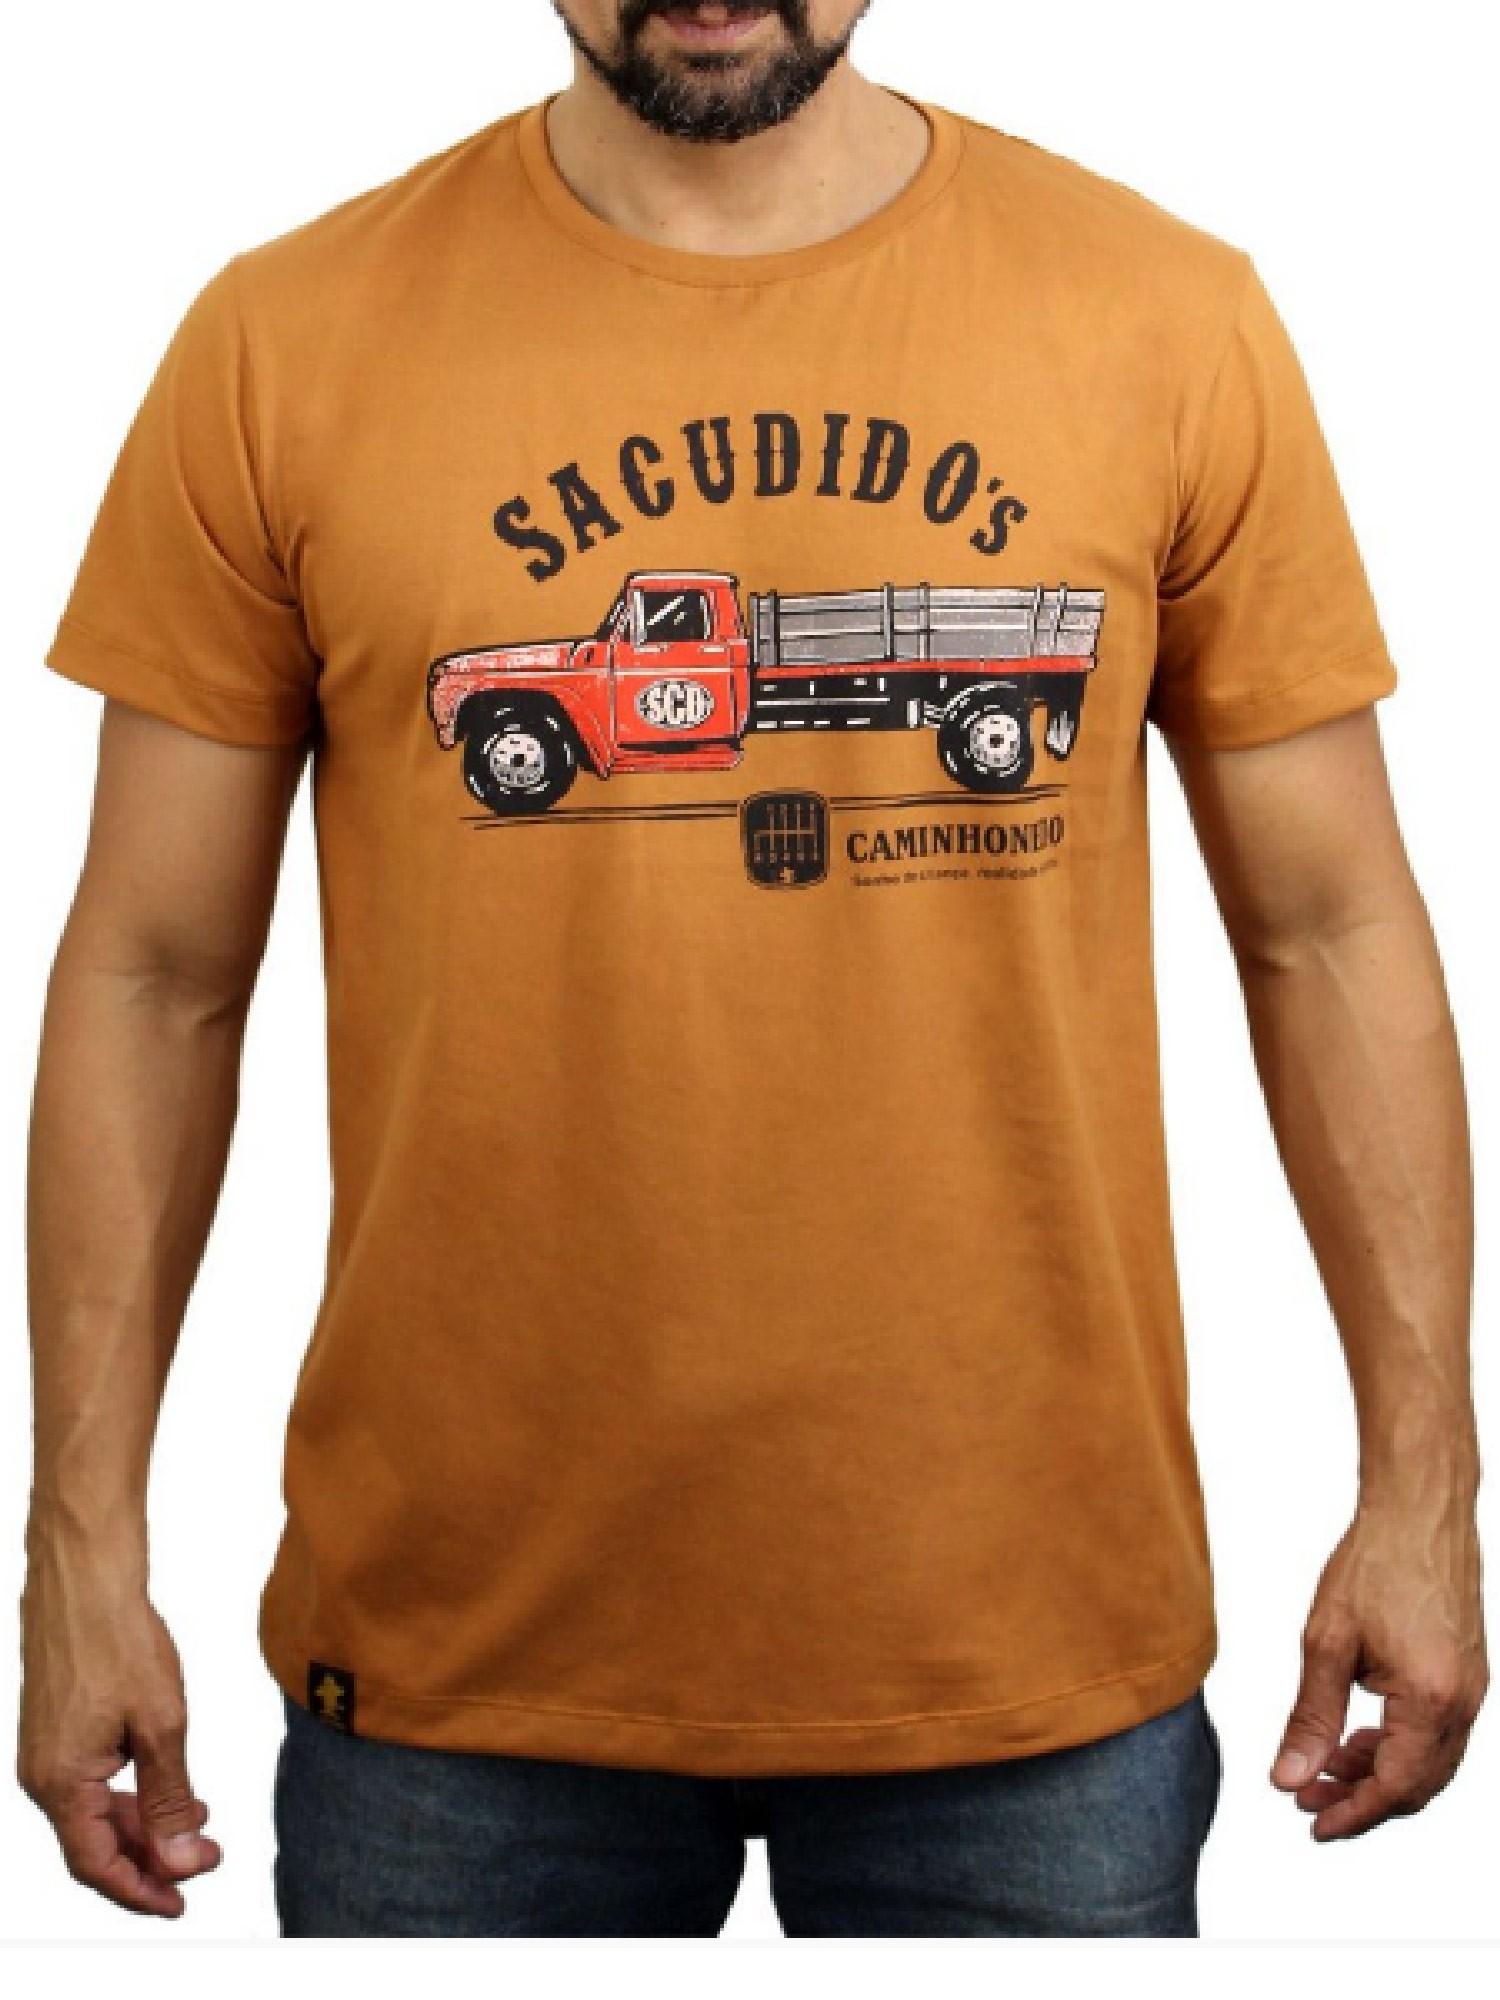 Camiseta Masculina Sacudido's Caminhao Desert